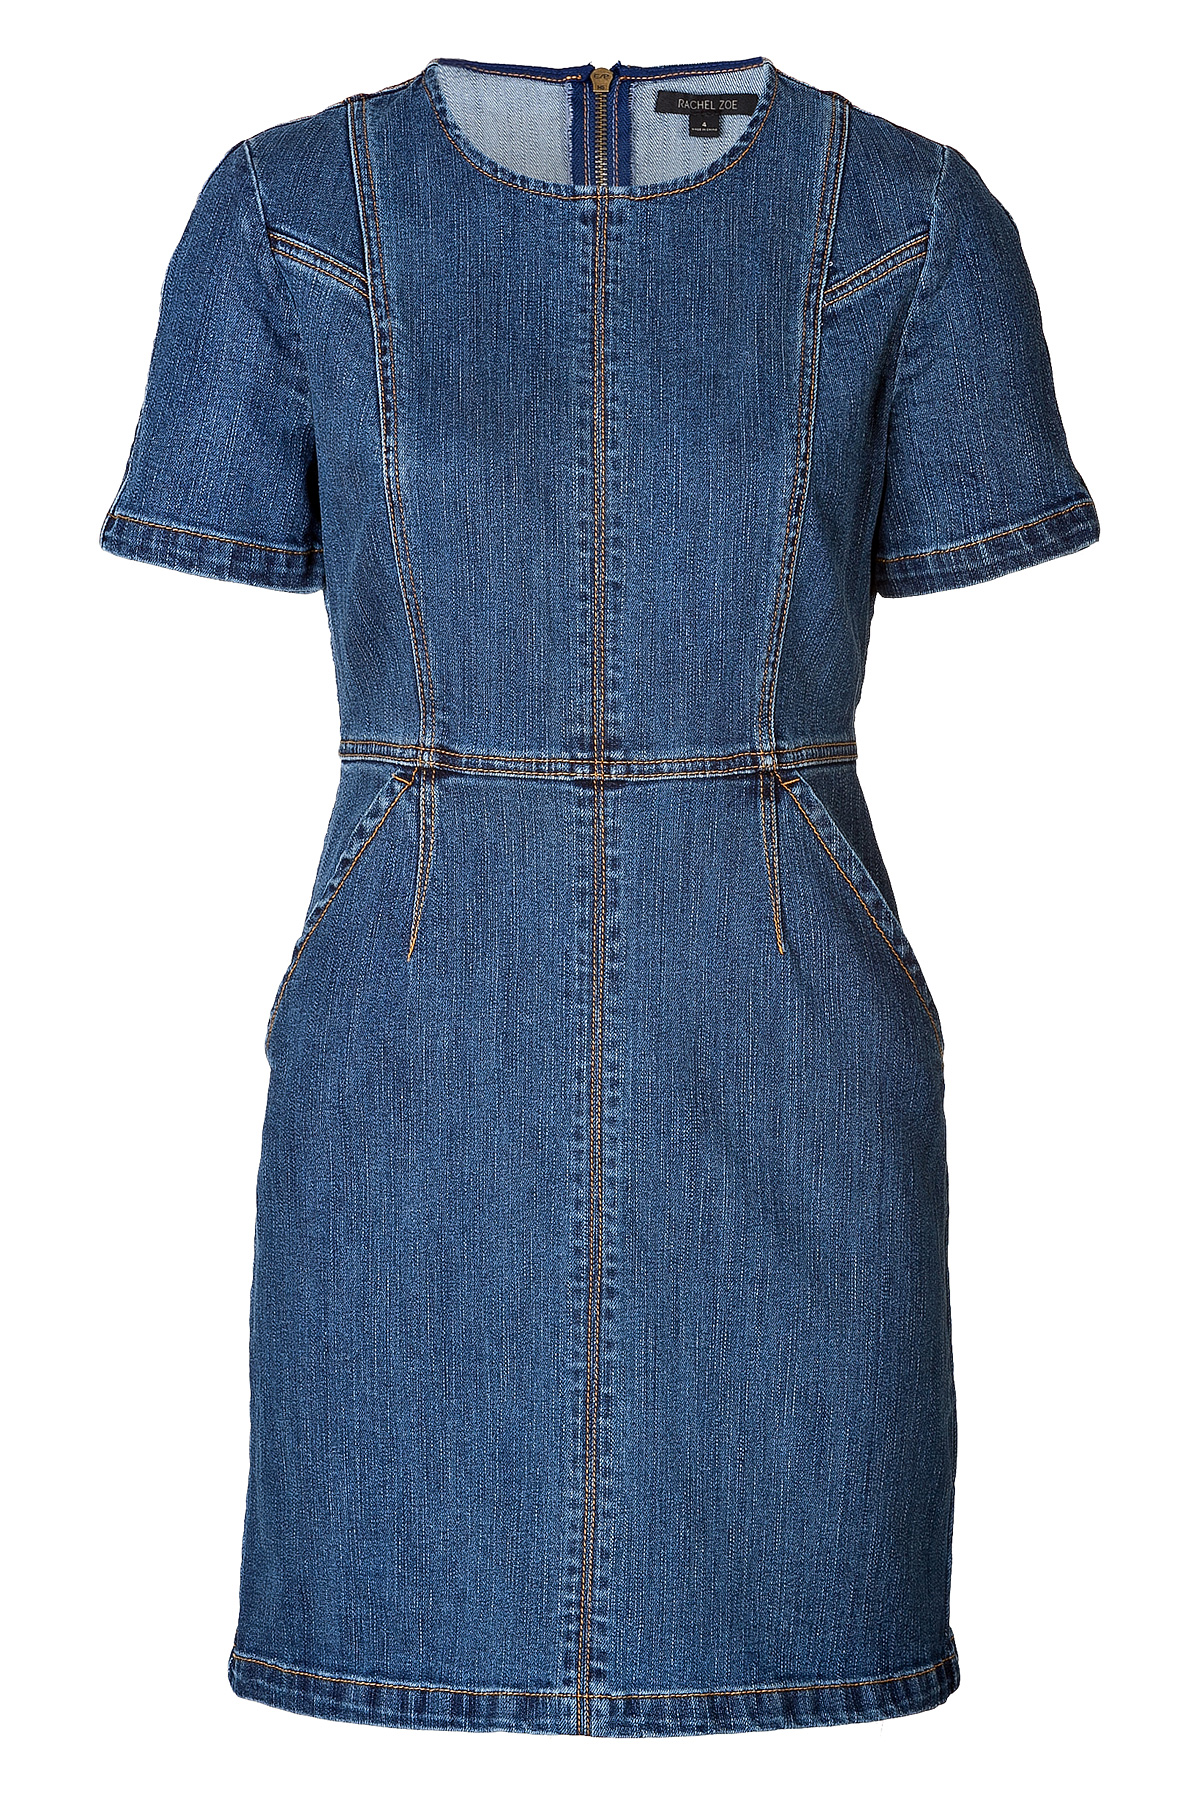 Rachel Zoe Denim Dress